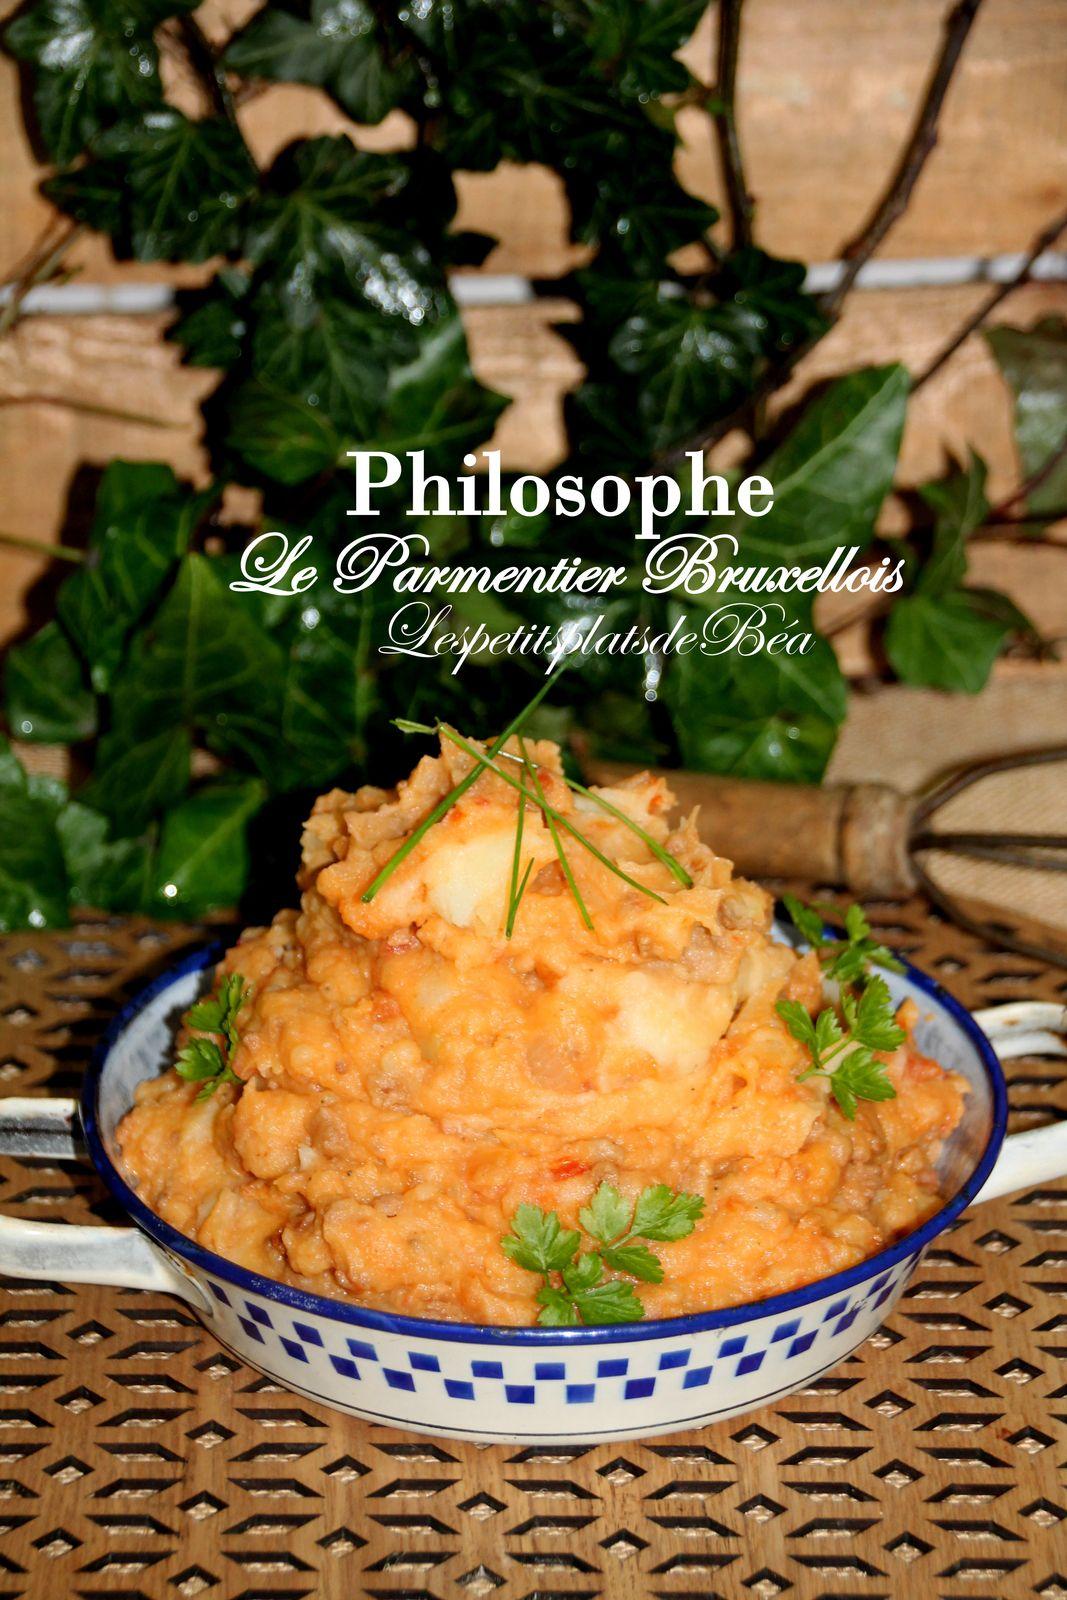 Le philosophe - balade bruxelloise